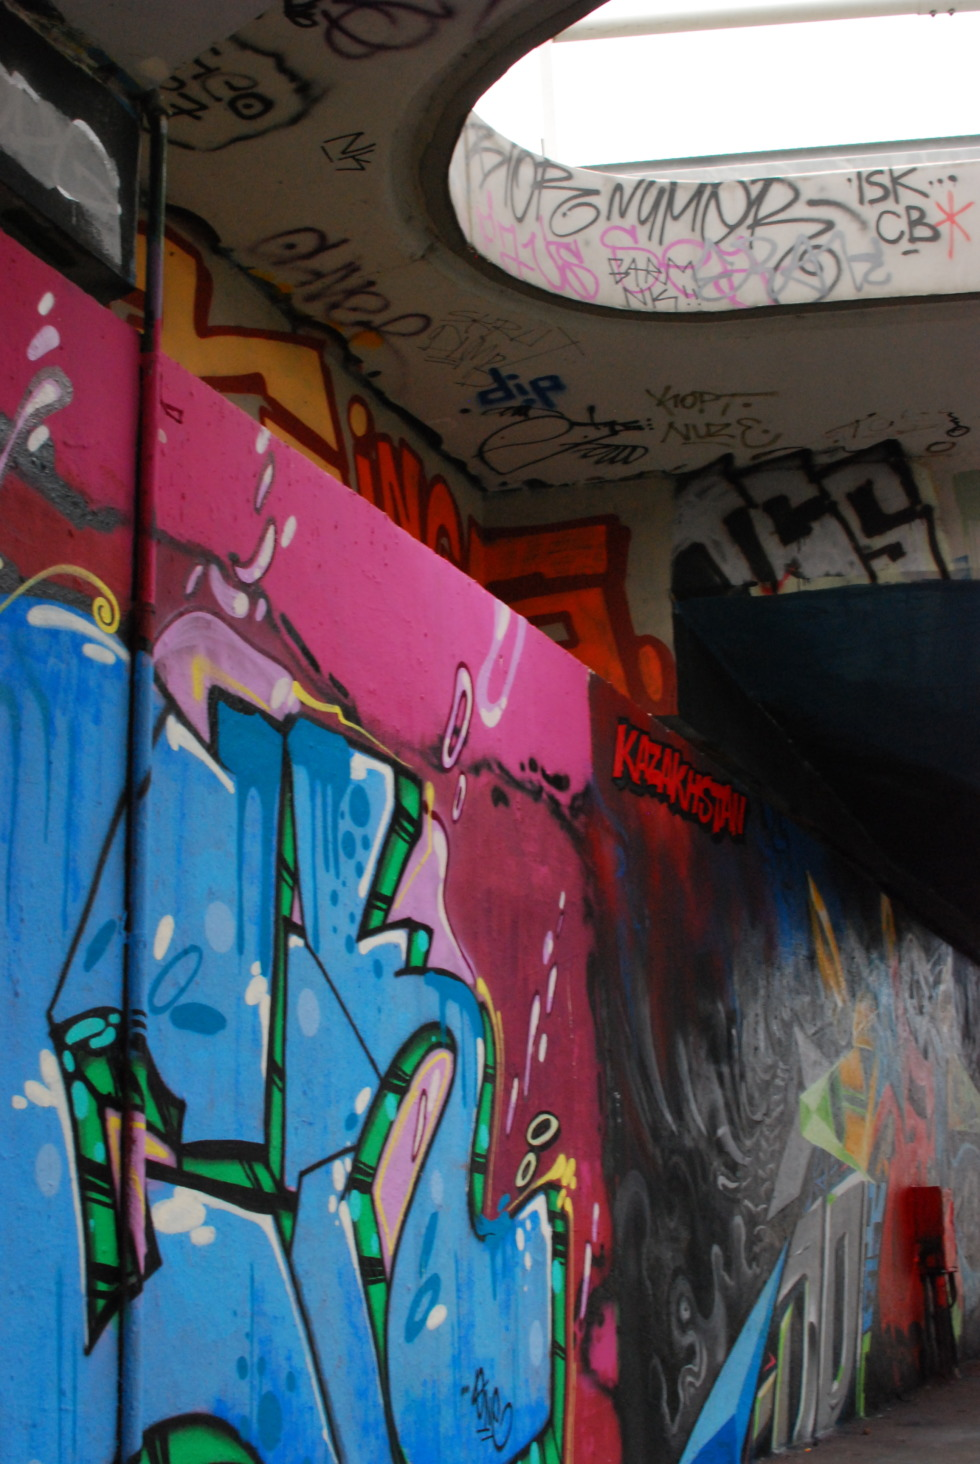 Graffiti on public graffiti wall in Prague